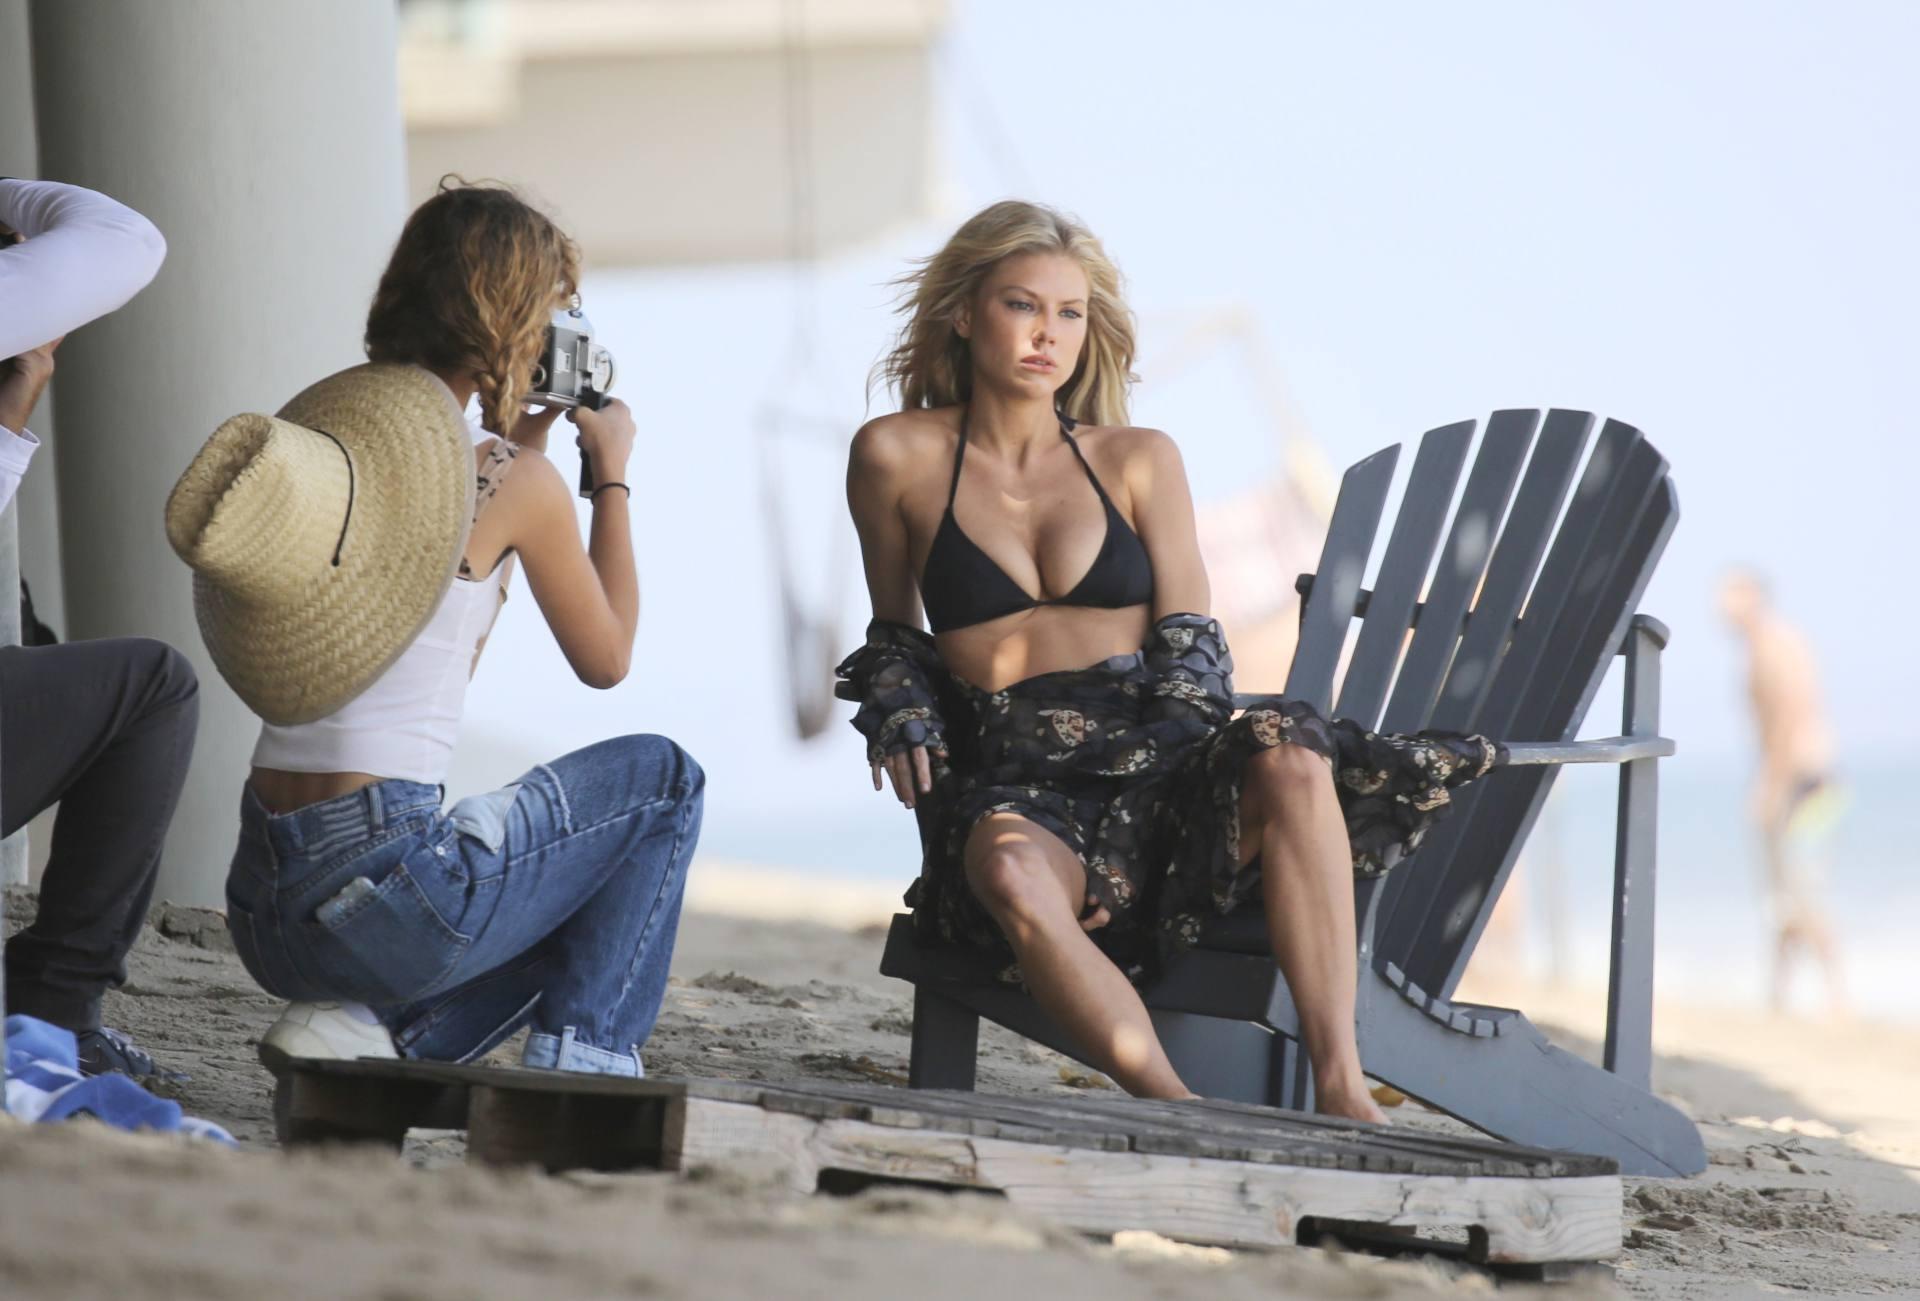 Charlotte Mckinney – Sexy Boobs In Tiny Bikini On The Beach In Los Angeles 0009